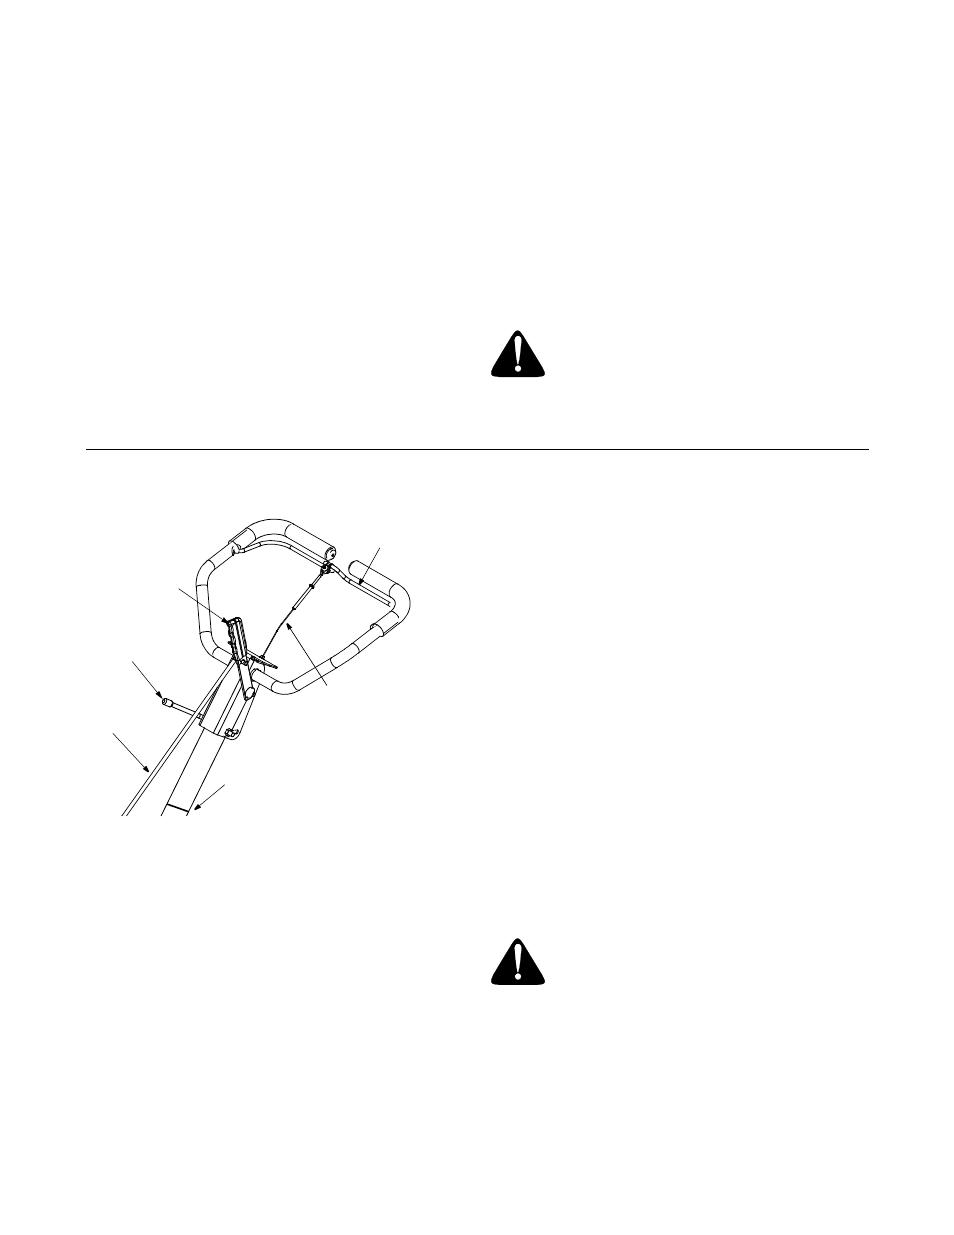 Tire pressure, Throttle control, Choke lever | Yard-Man RT65 User